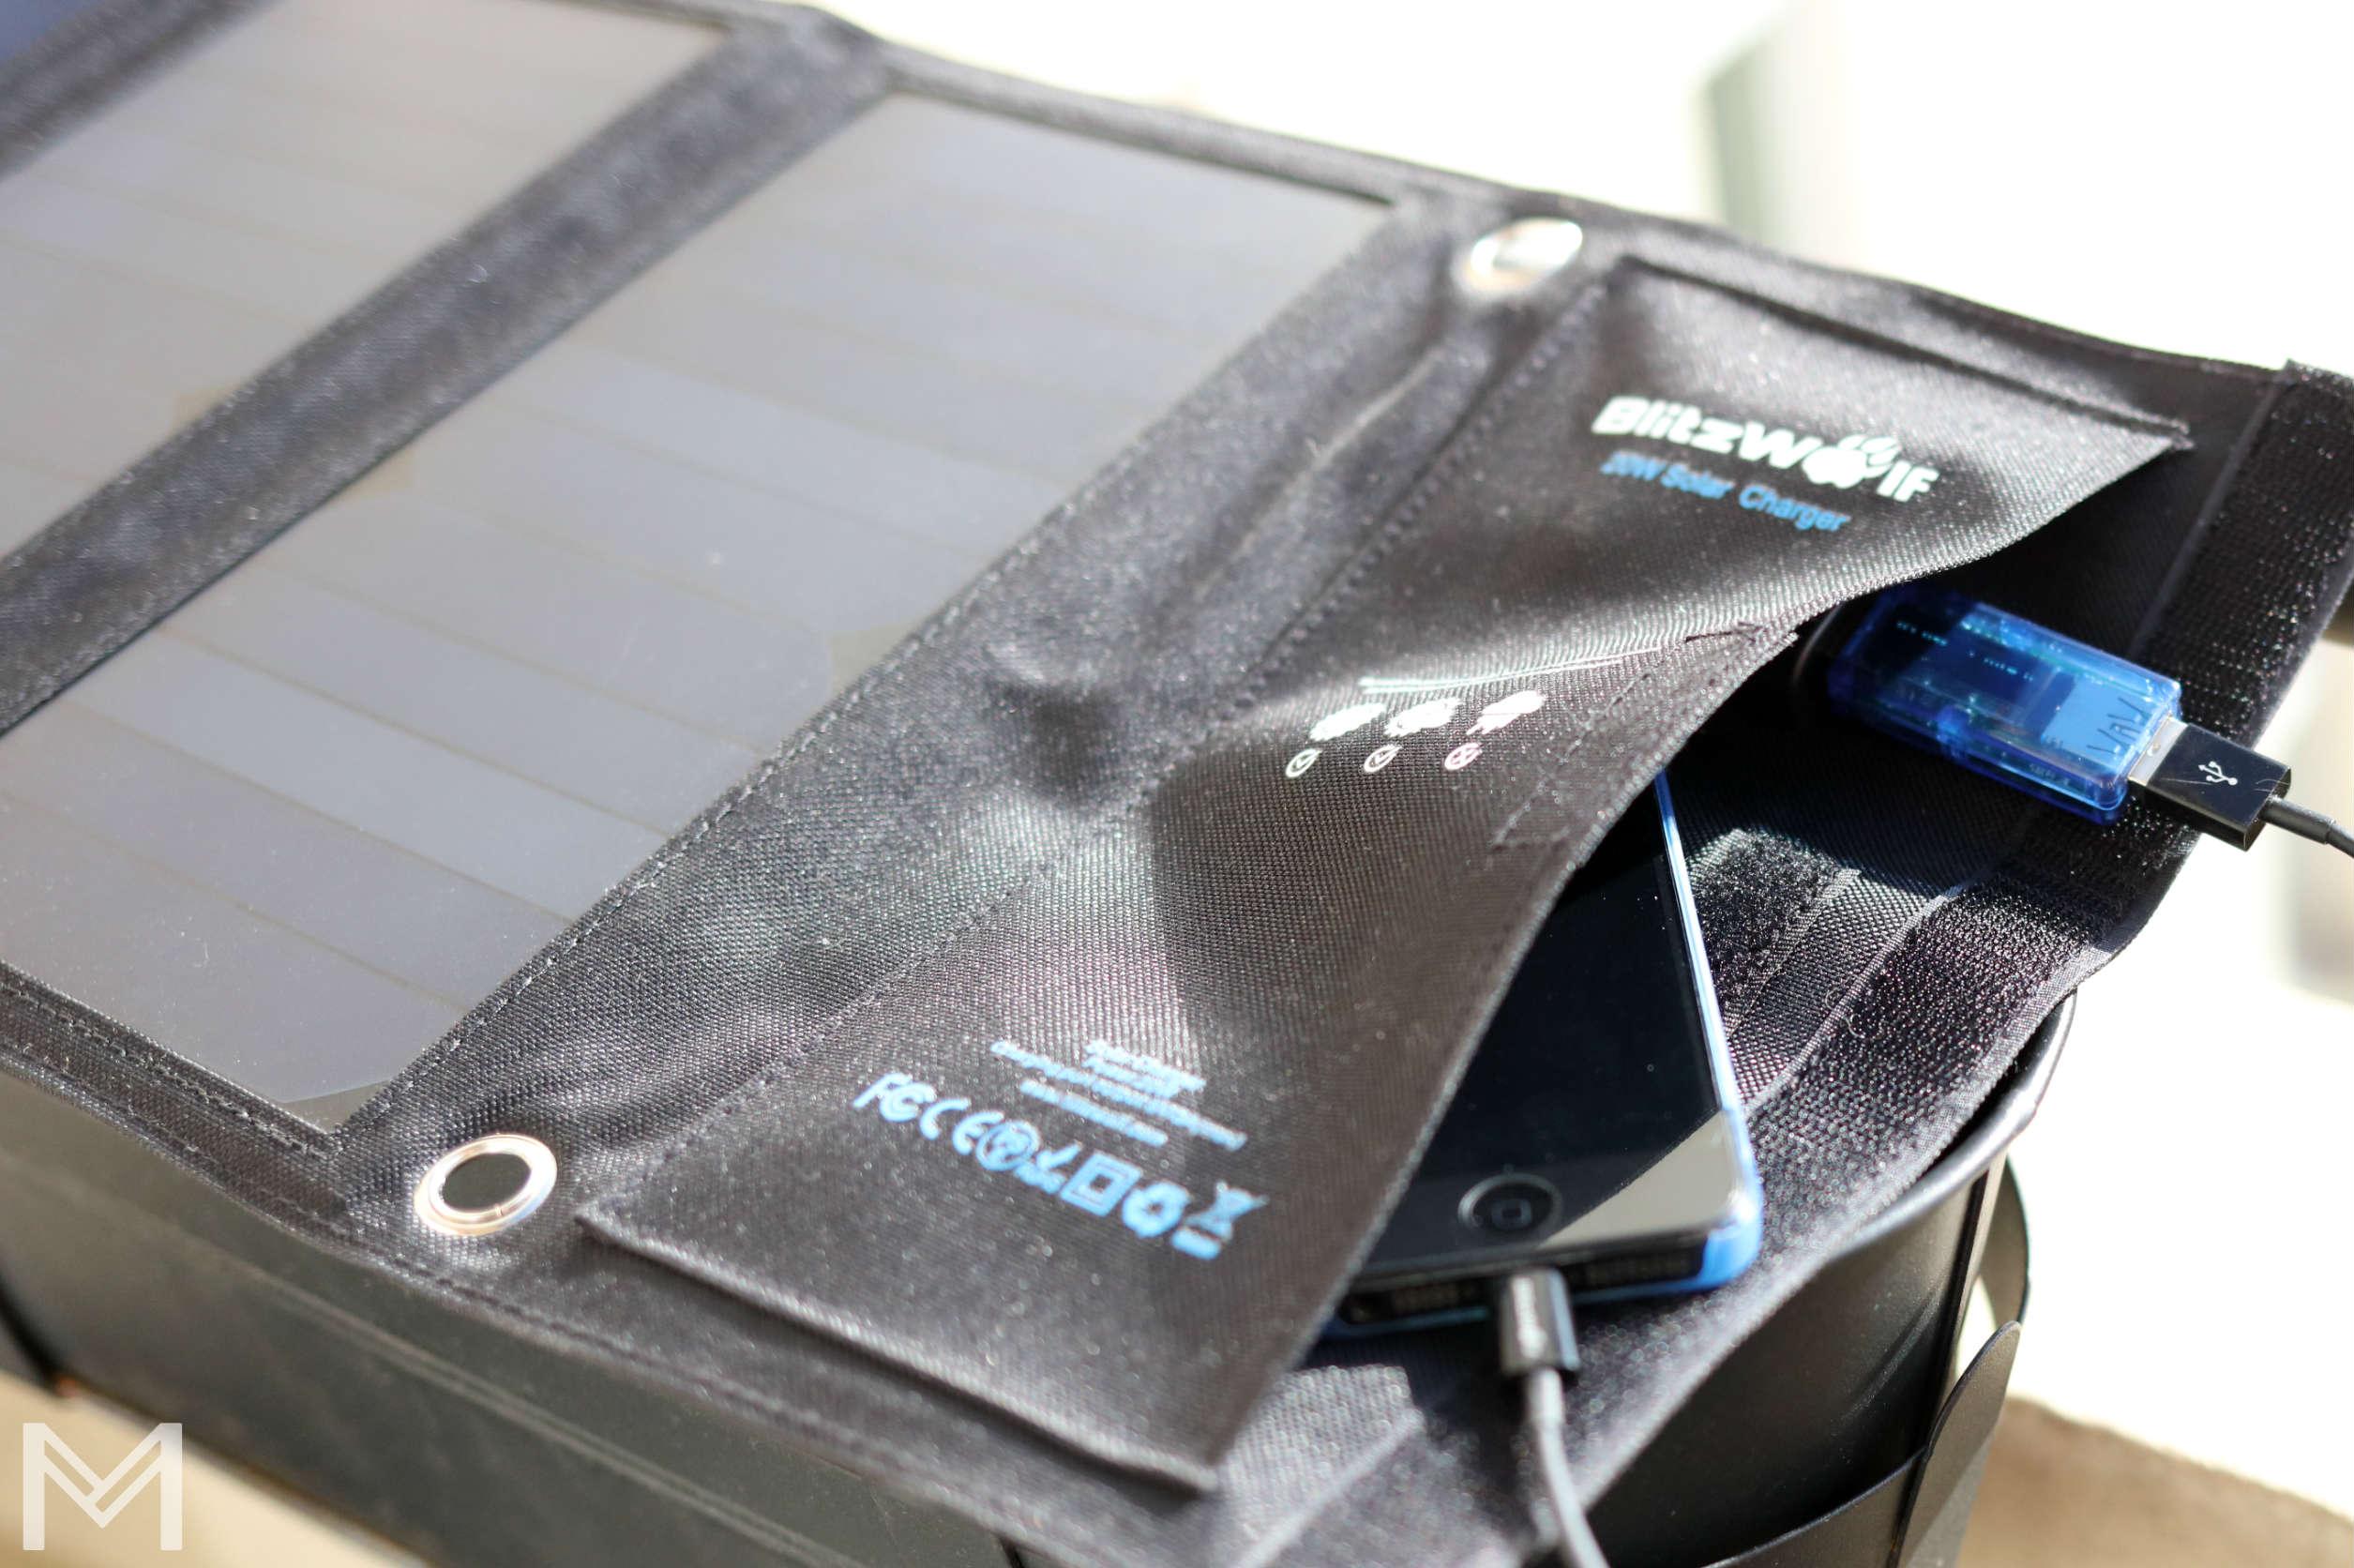 blitzwolf solar charger storage tasche power bank 20w 3a metropolitanmonkey.com